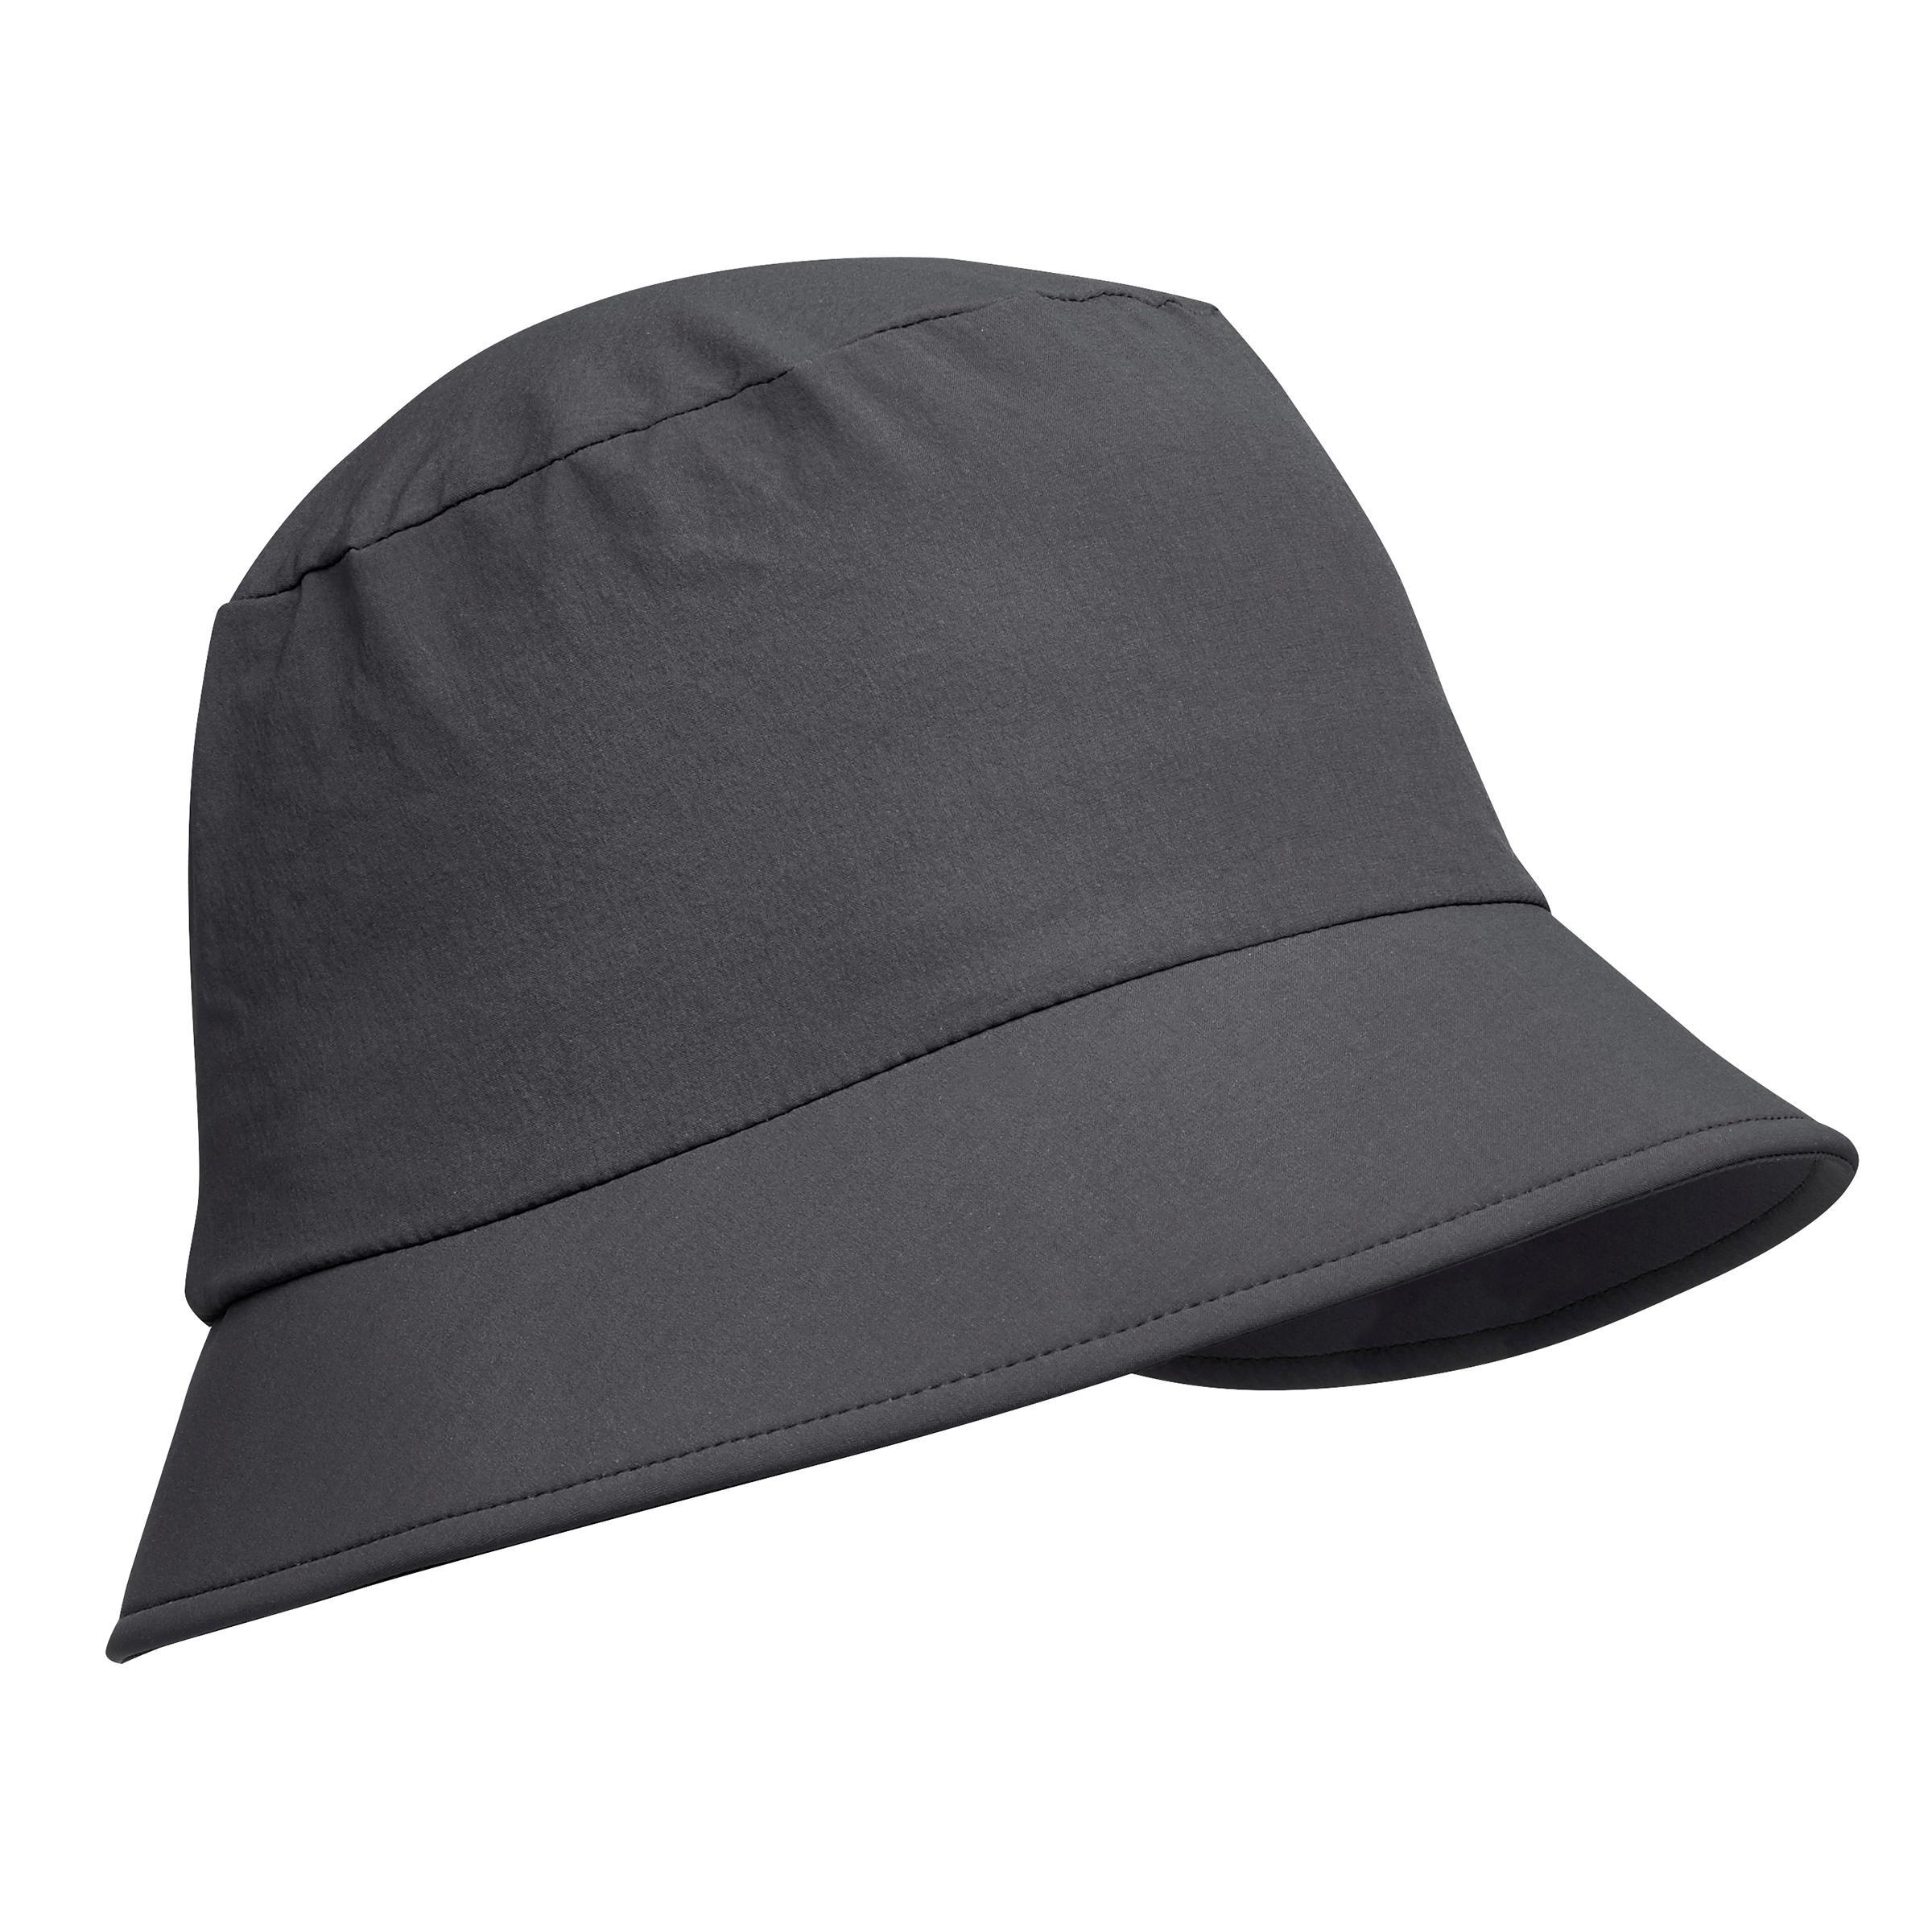 1a8a20037cc6 Comprar Sombreros para Deporte